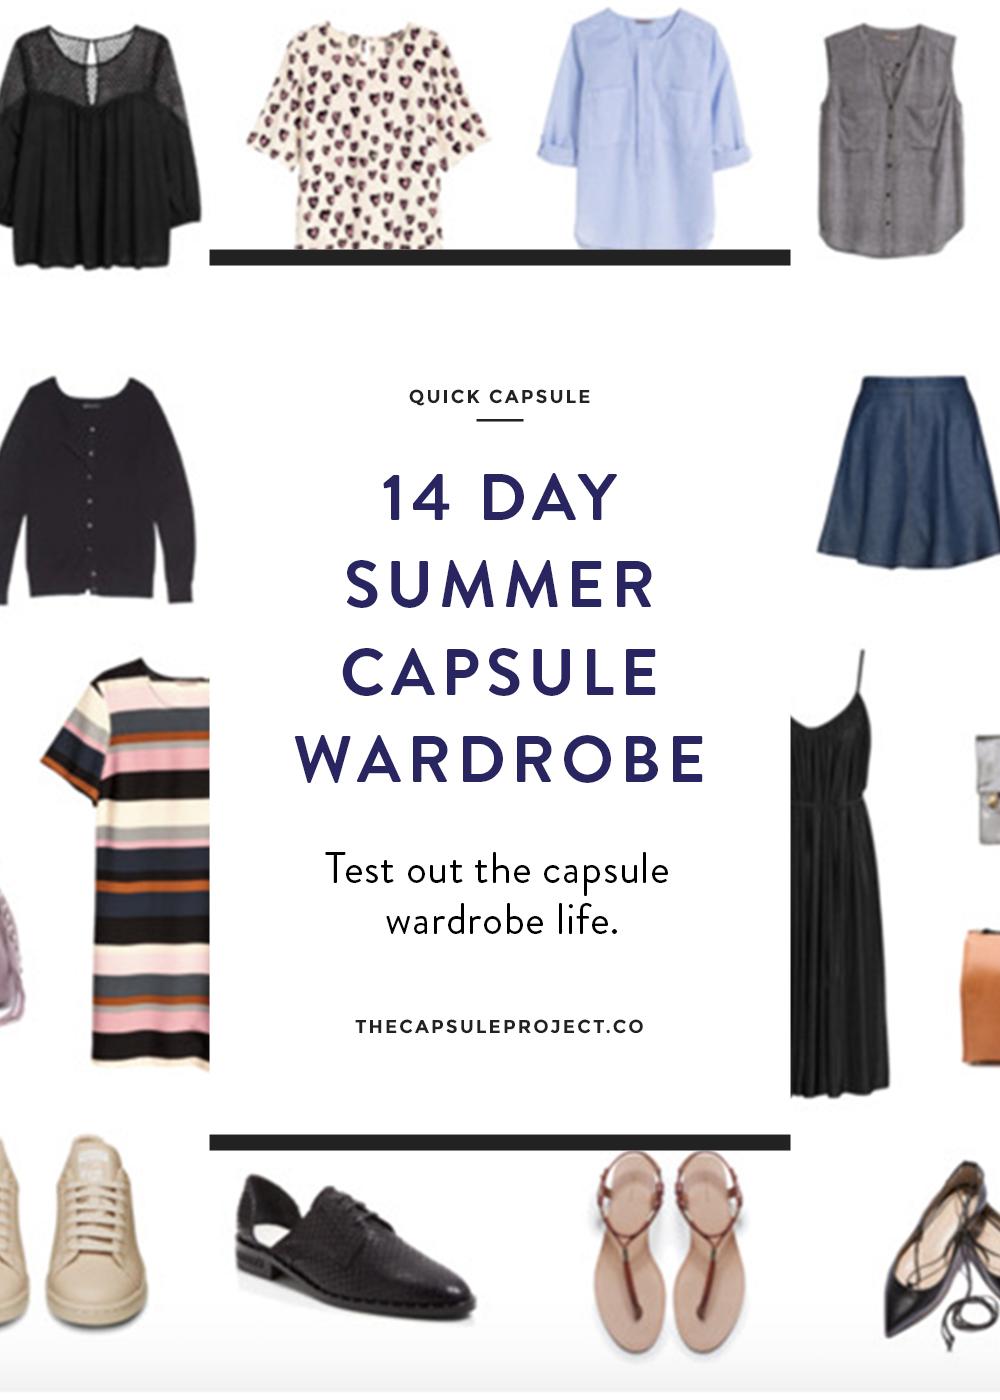 14 Day Summer Capsule Wardrobe